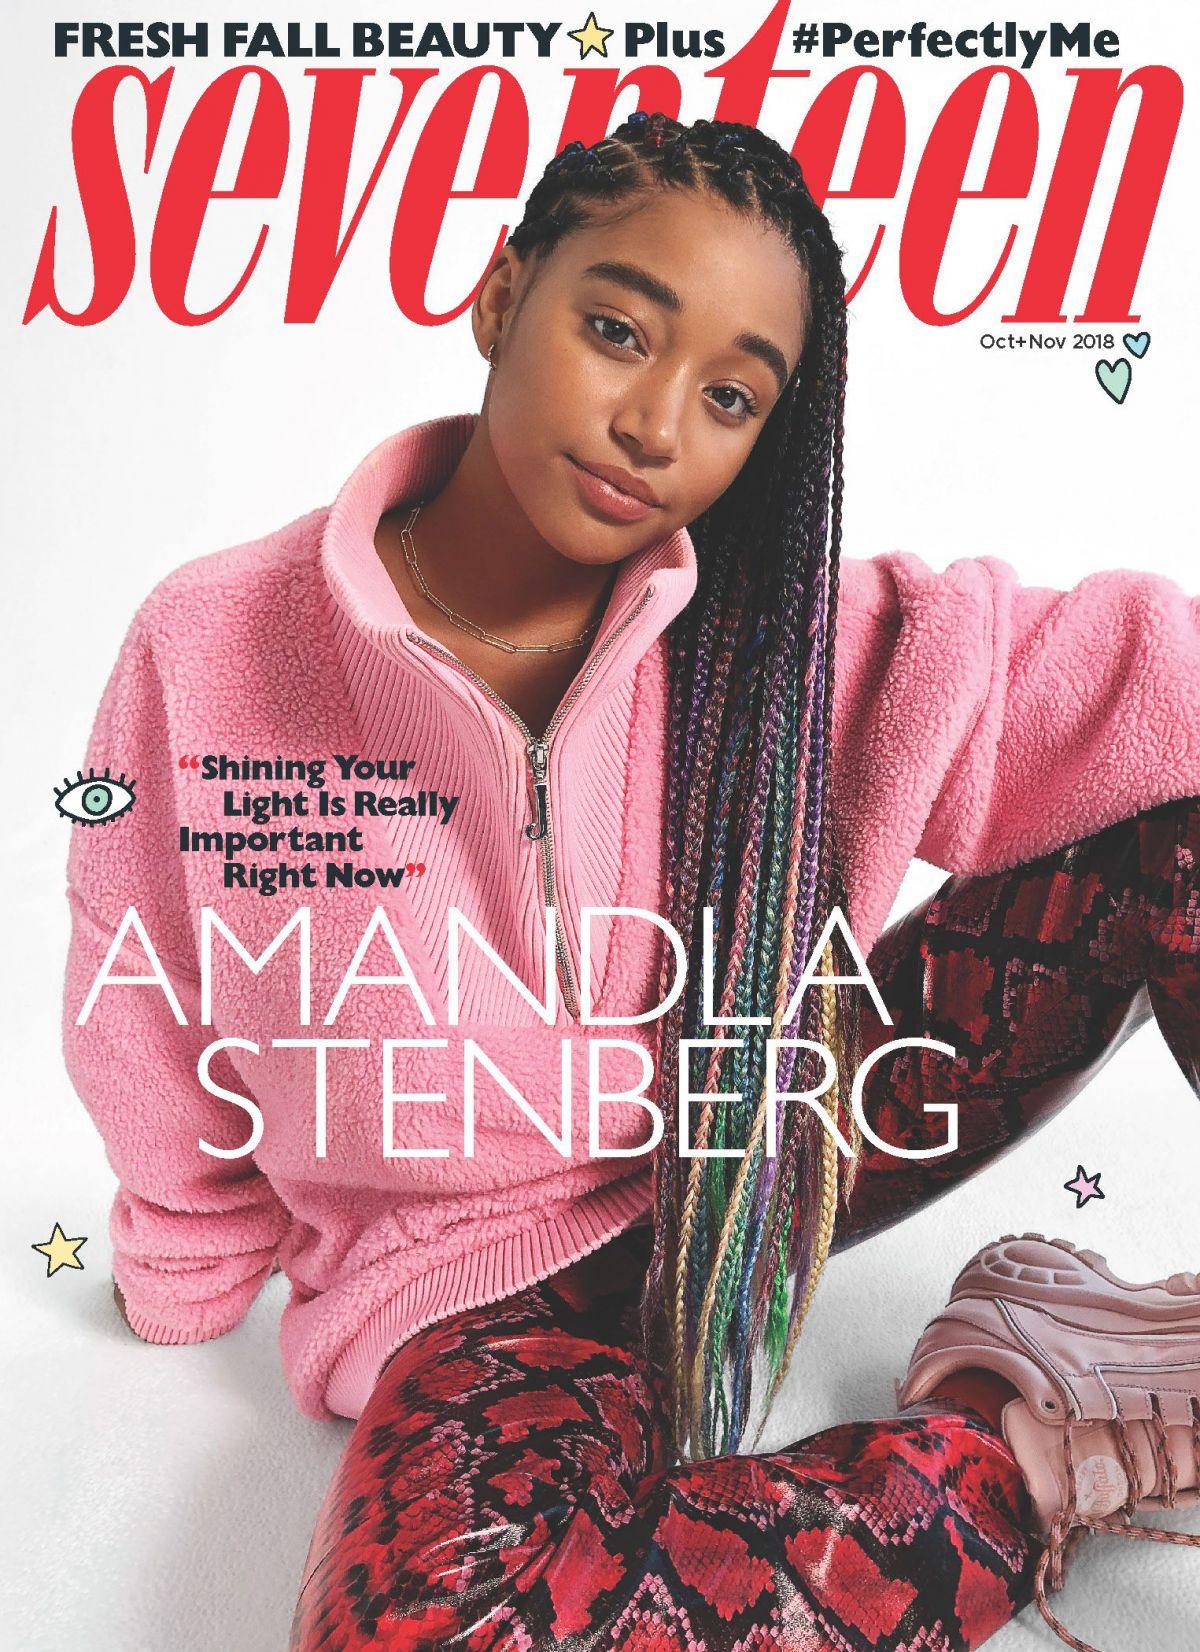 Amandla Stenberg Photoshoot amandla stenberg for seventeen magazine, october/november